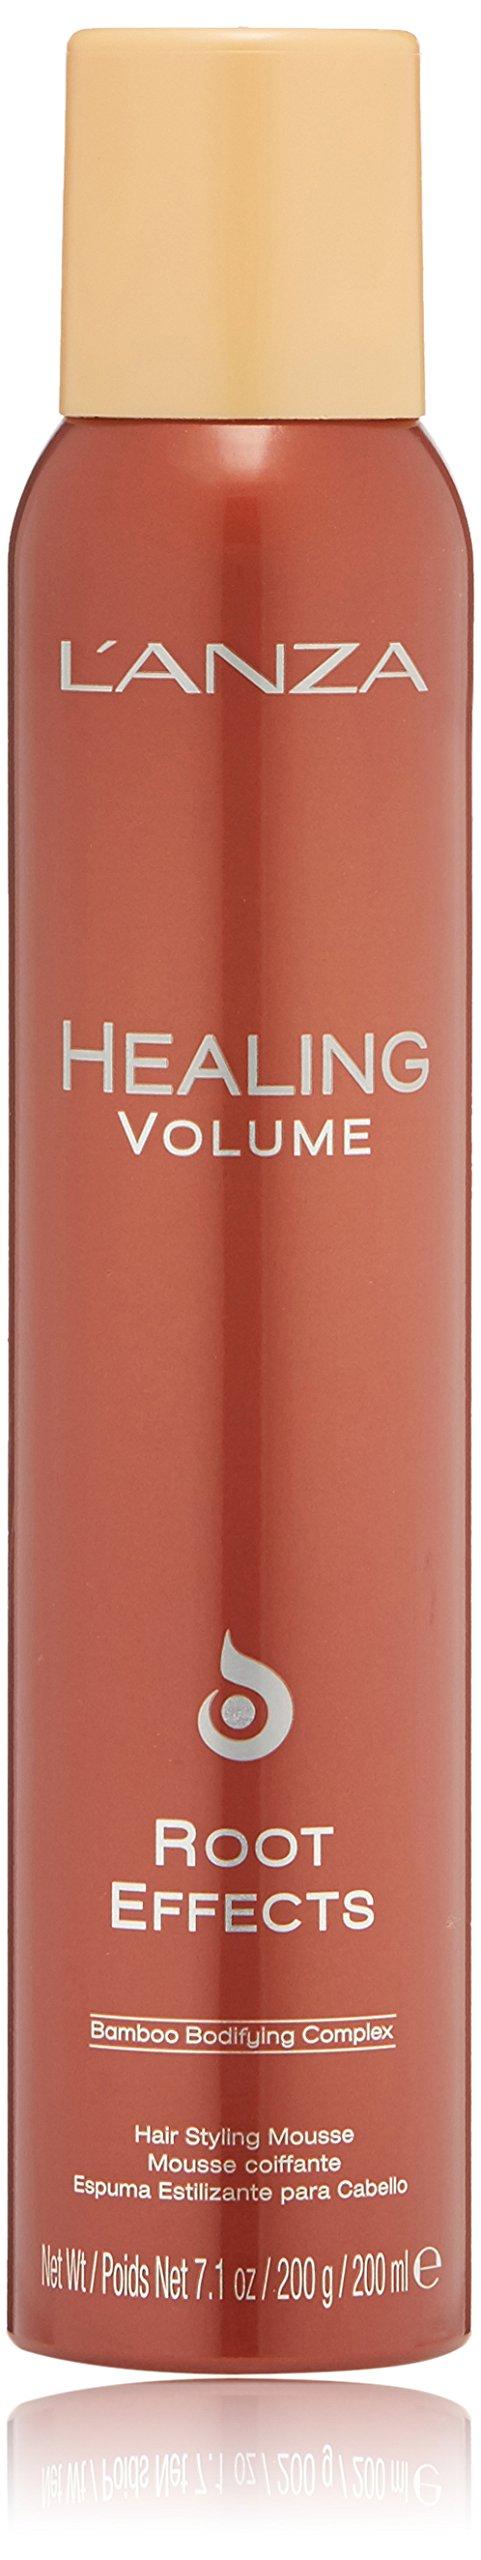 L'ANZA Healing Volume Root Effects, 7.1 oz.